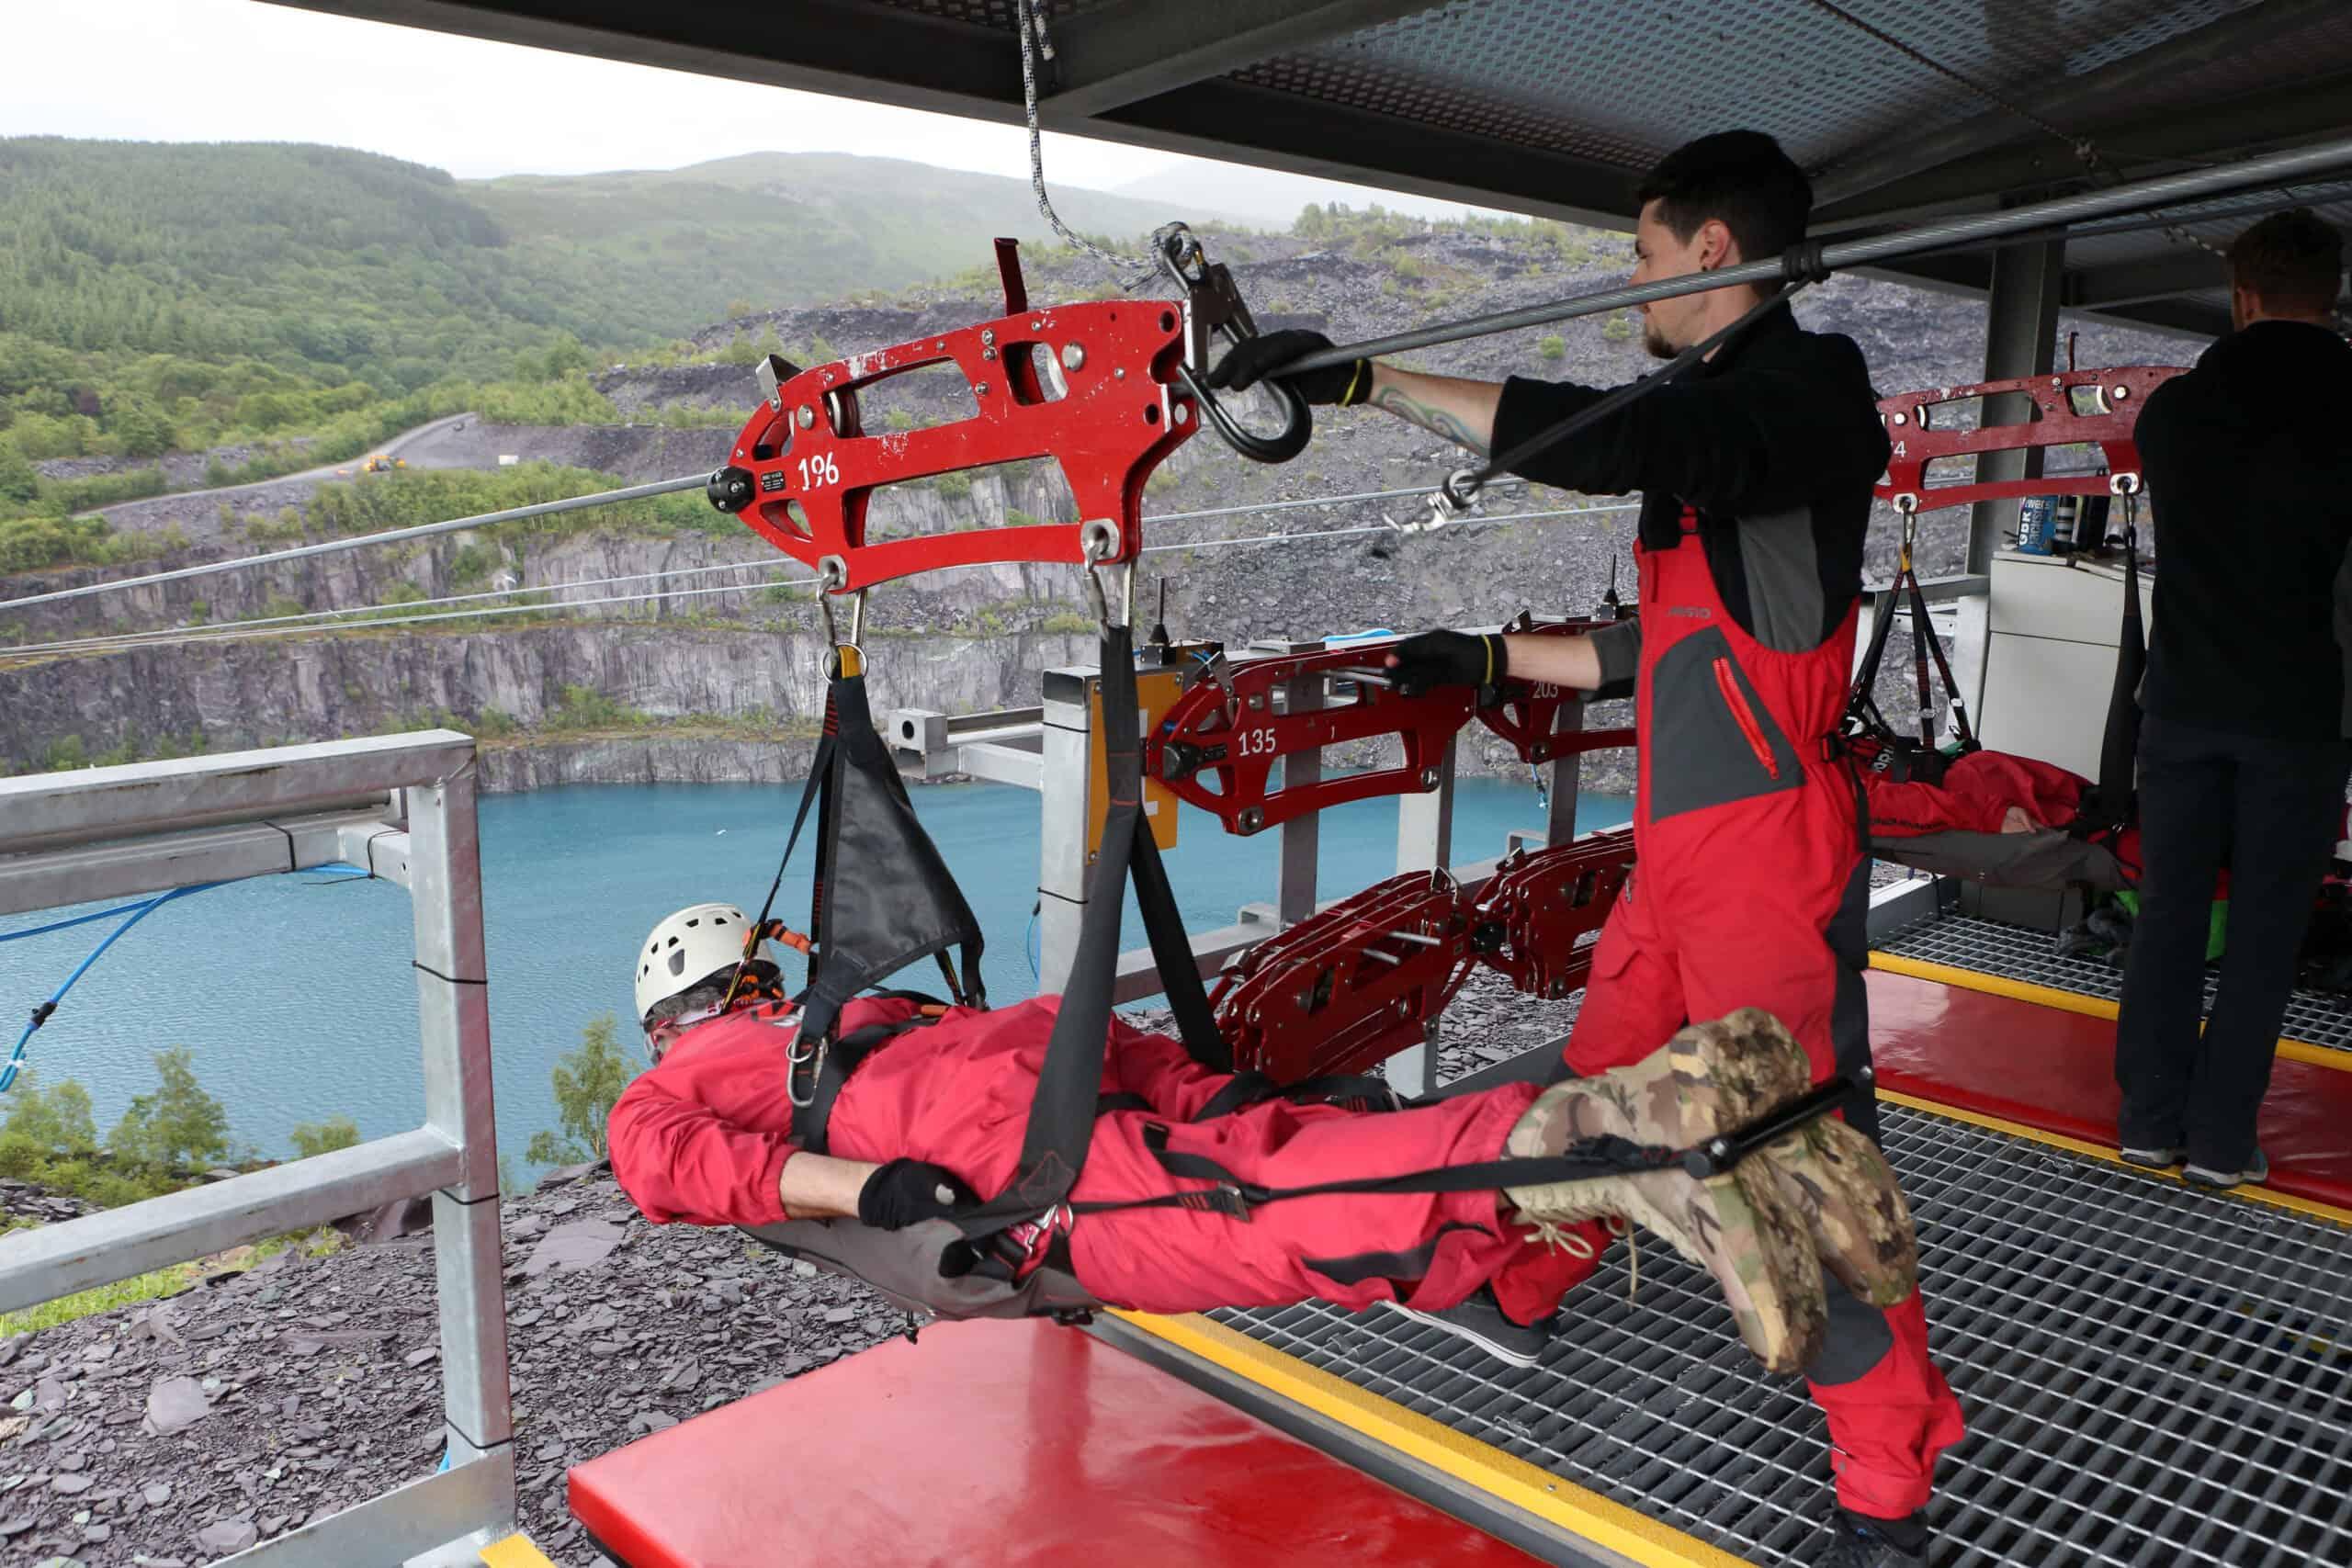 Adrenaline-Filled Adventure Breaks in Wales - Zip Wire in Snowdonia